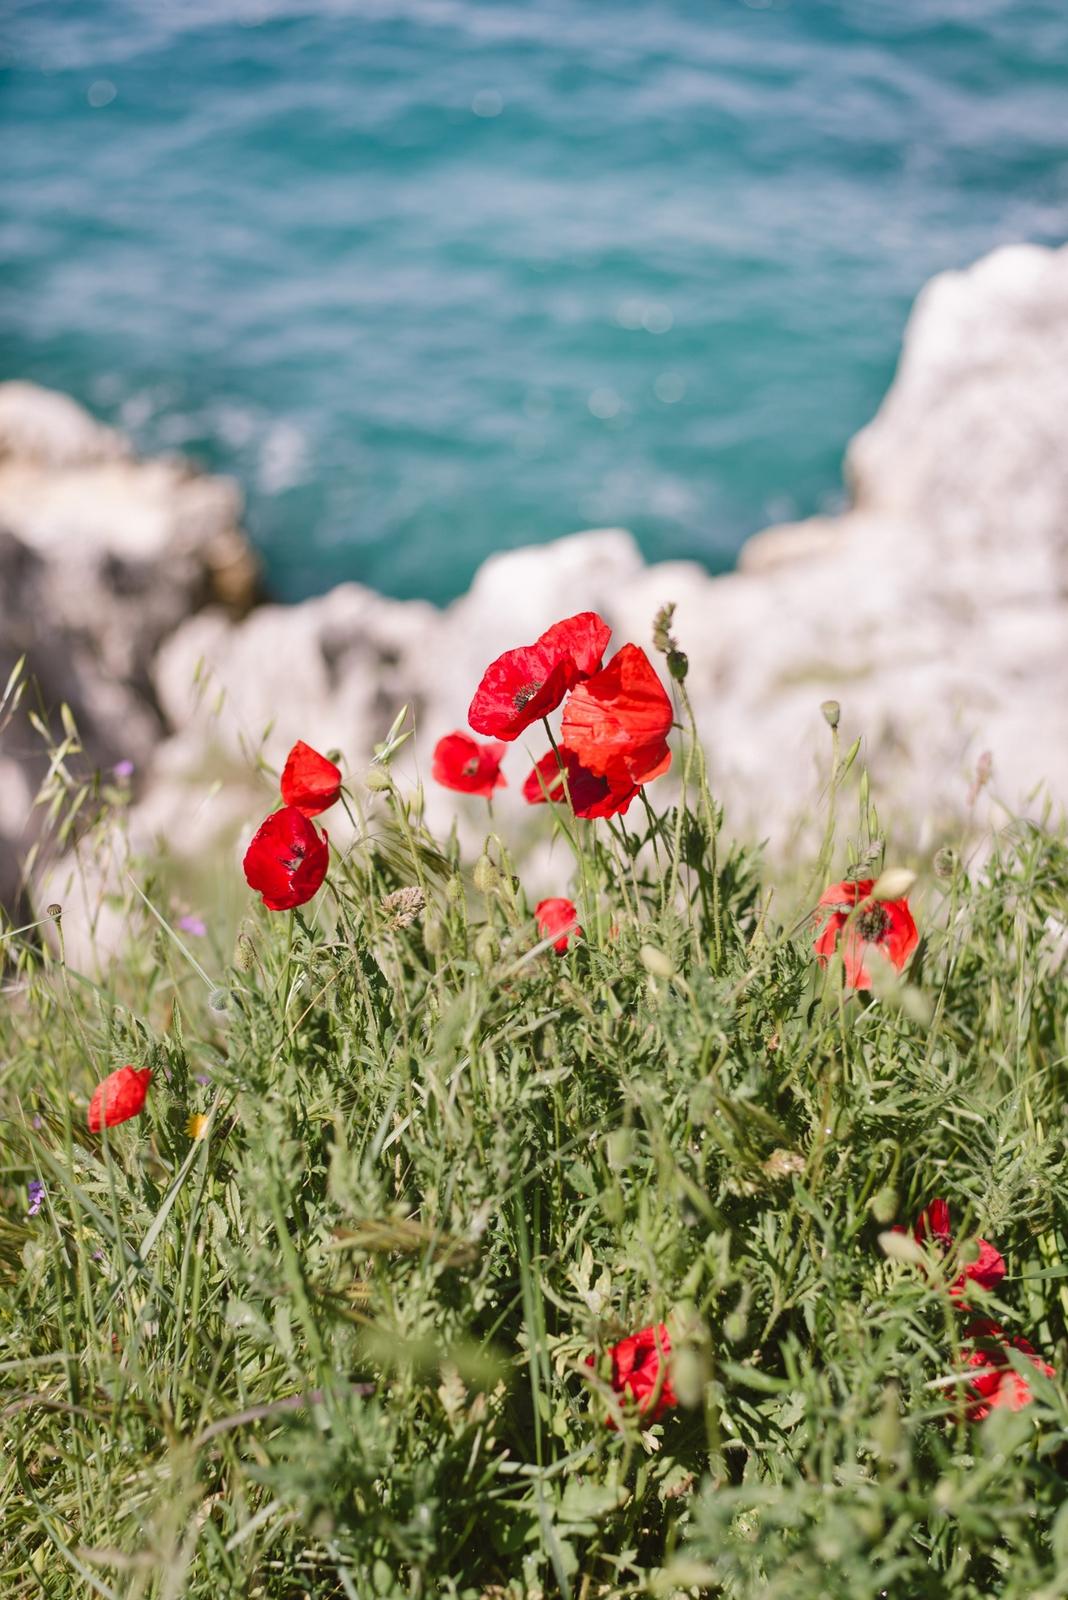 Red poppies on Šetalište braće Gnot, Rovinj, Croatia - from travel blog http://Epepa.eu